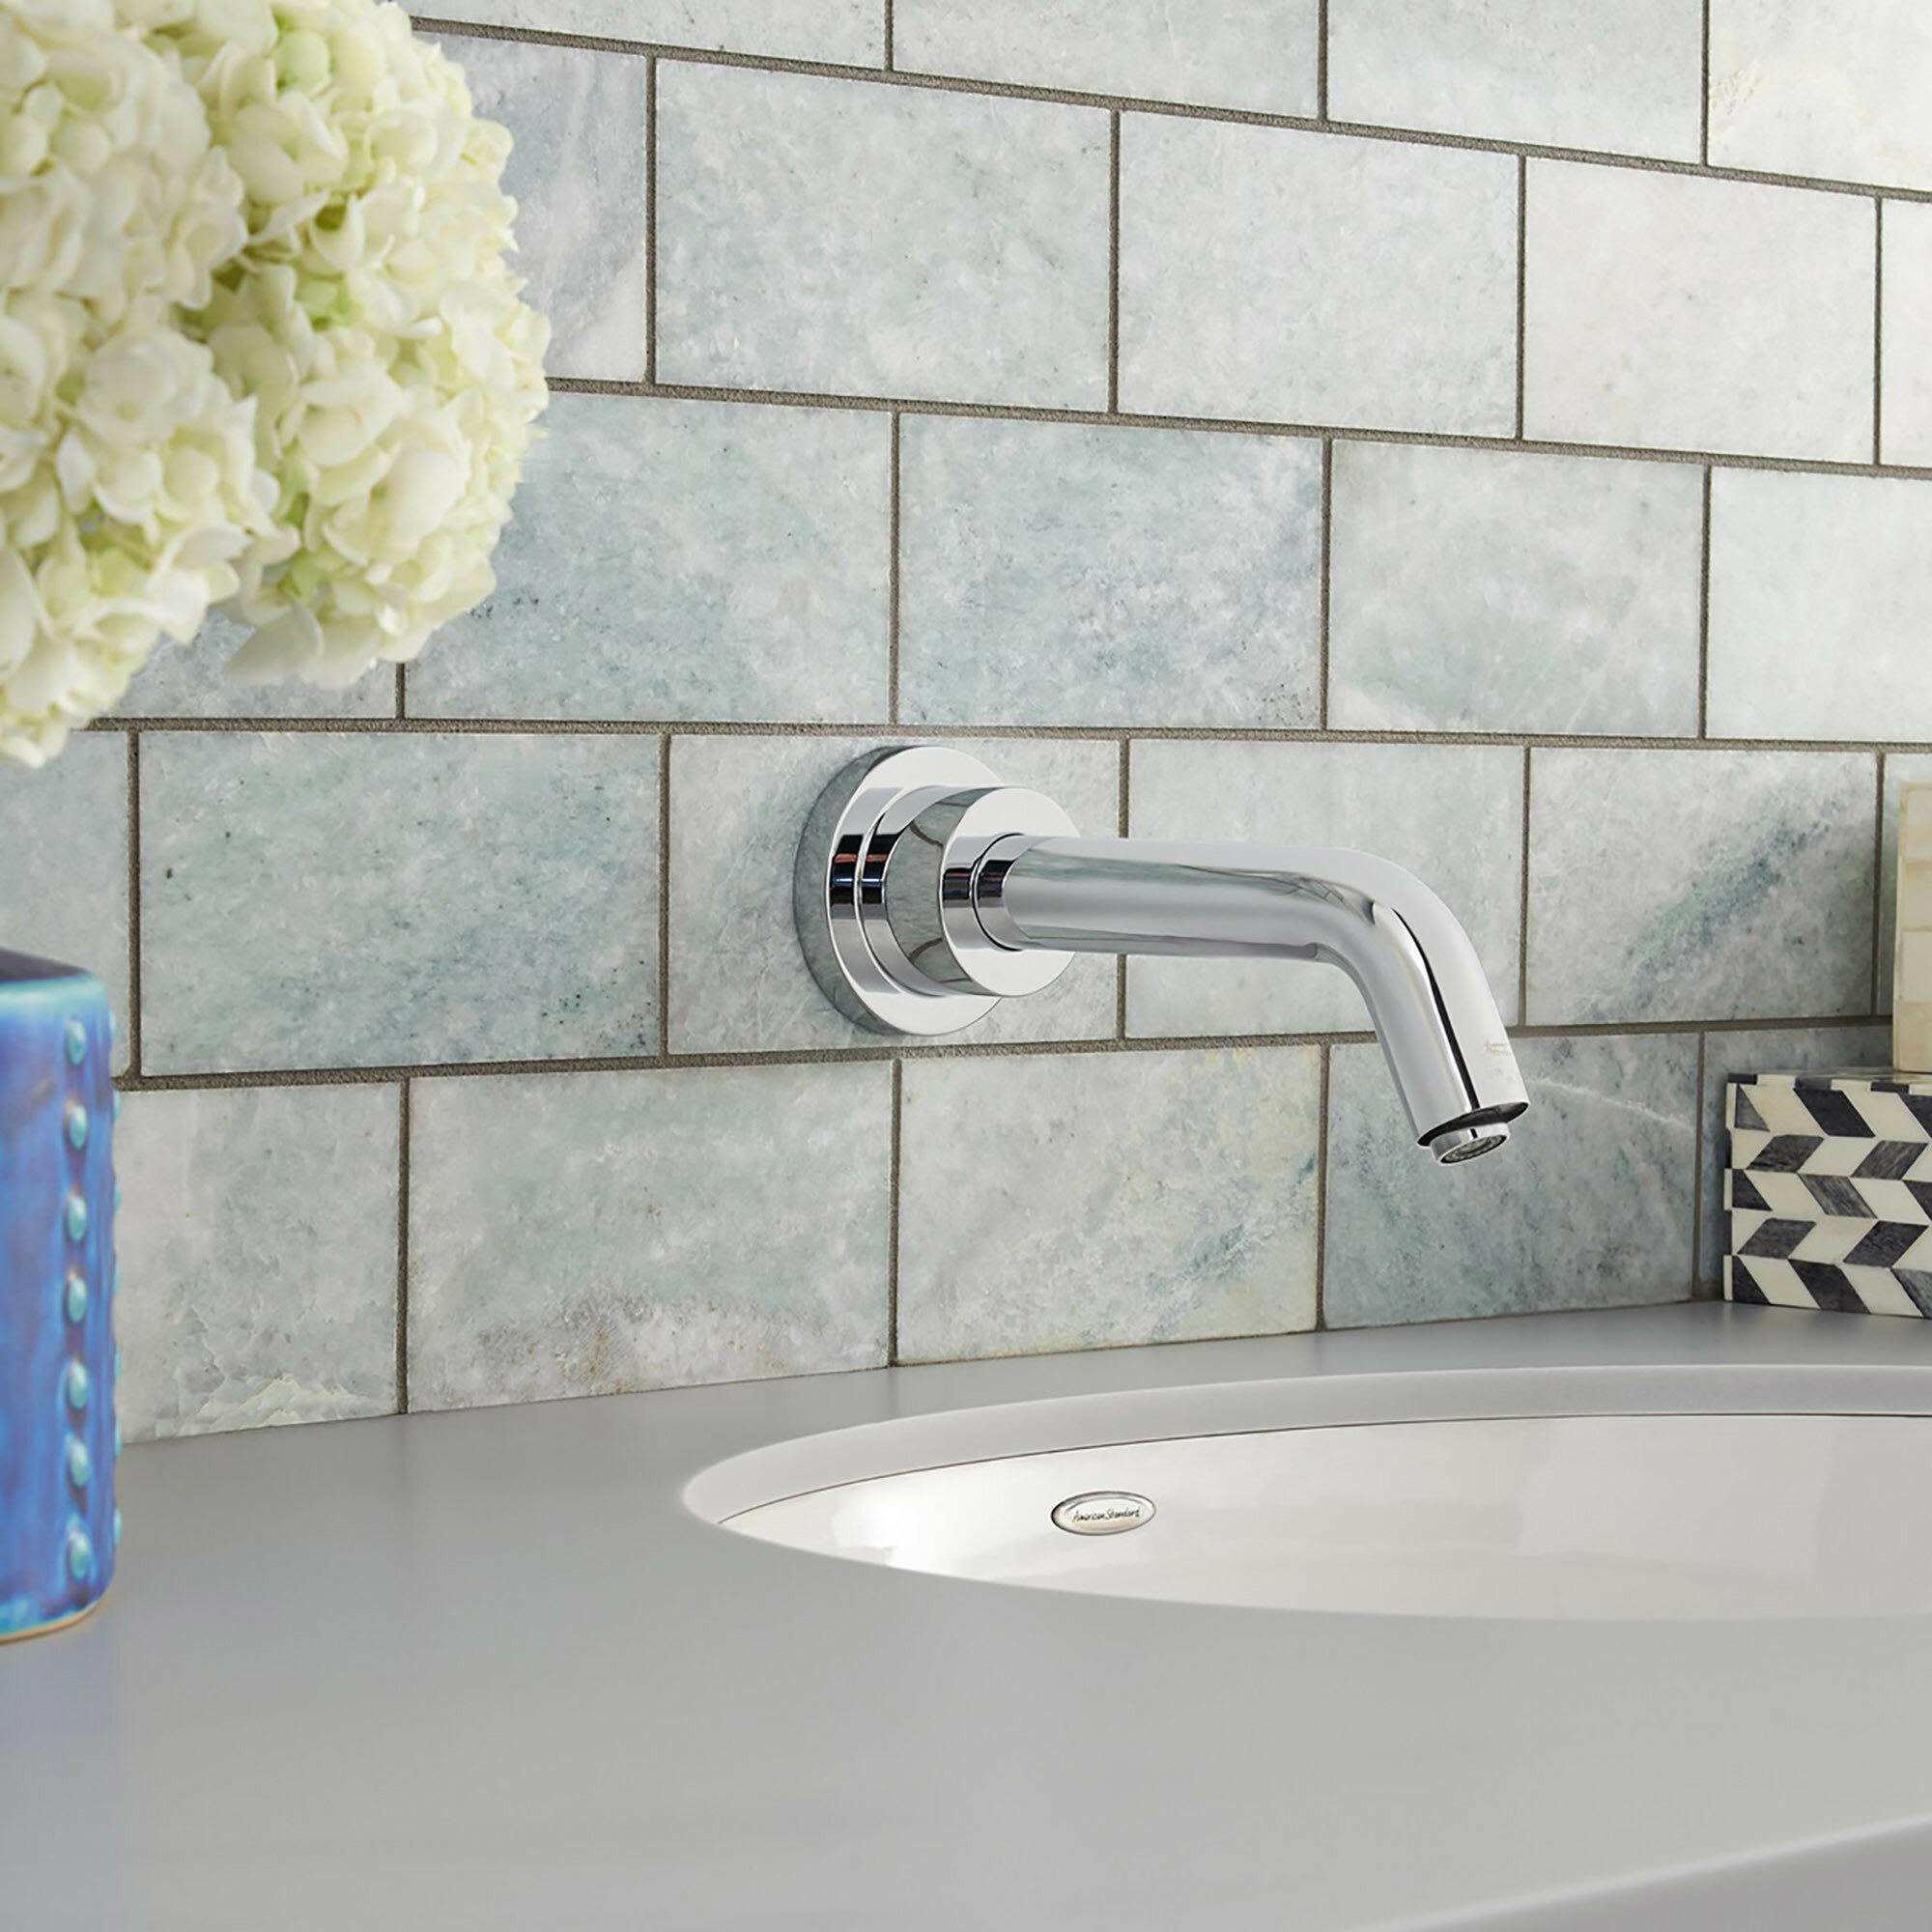 Charmant American Standard Serin Wall Mounted Bathroom Faucet Less Handle | Wayfair